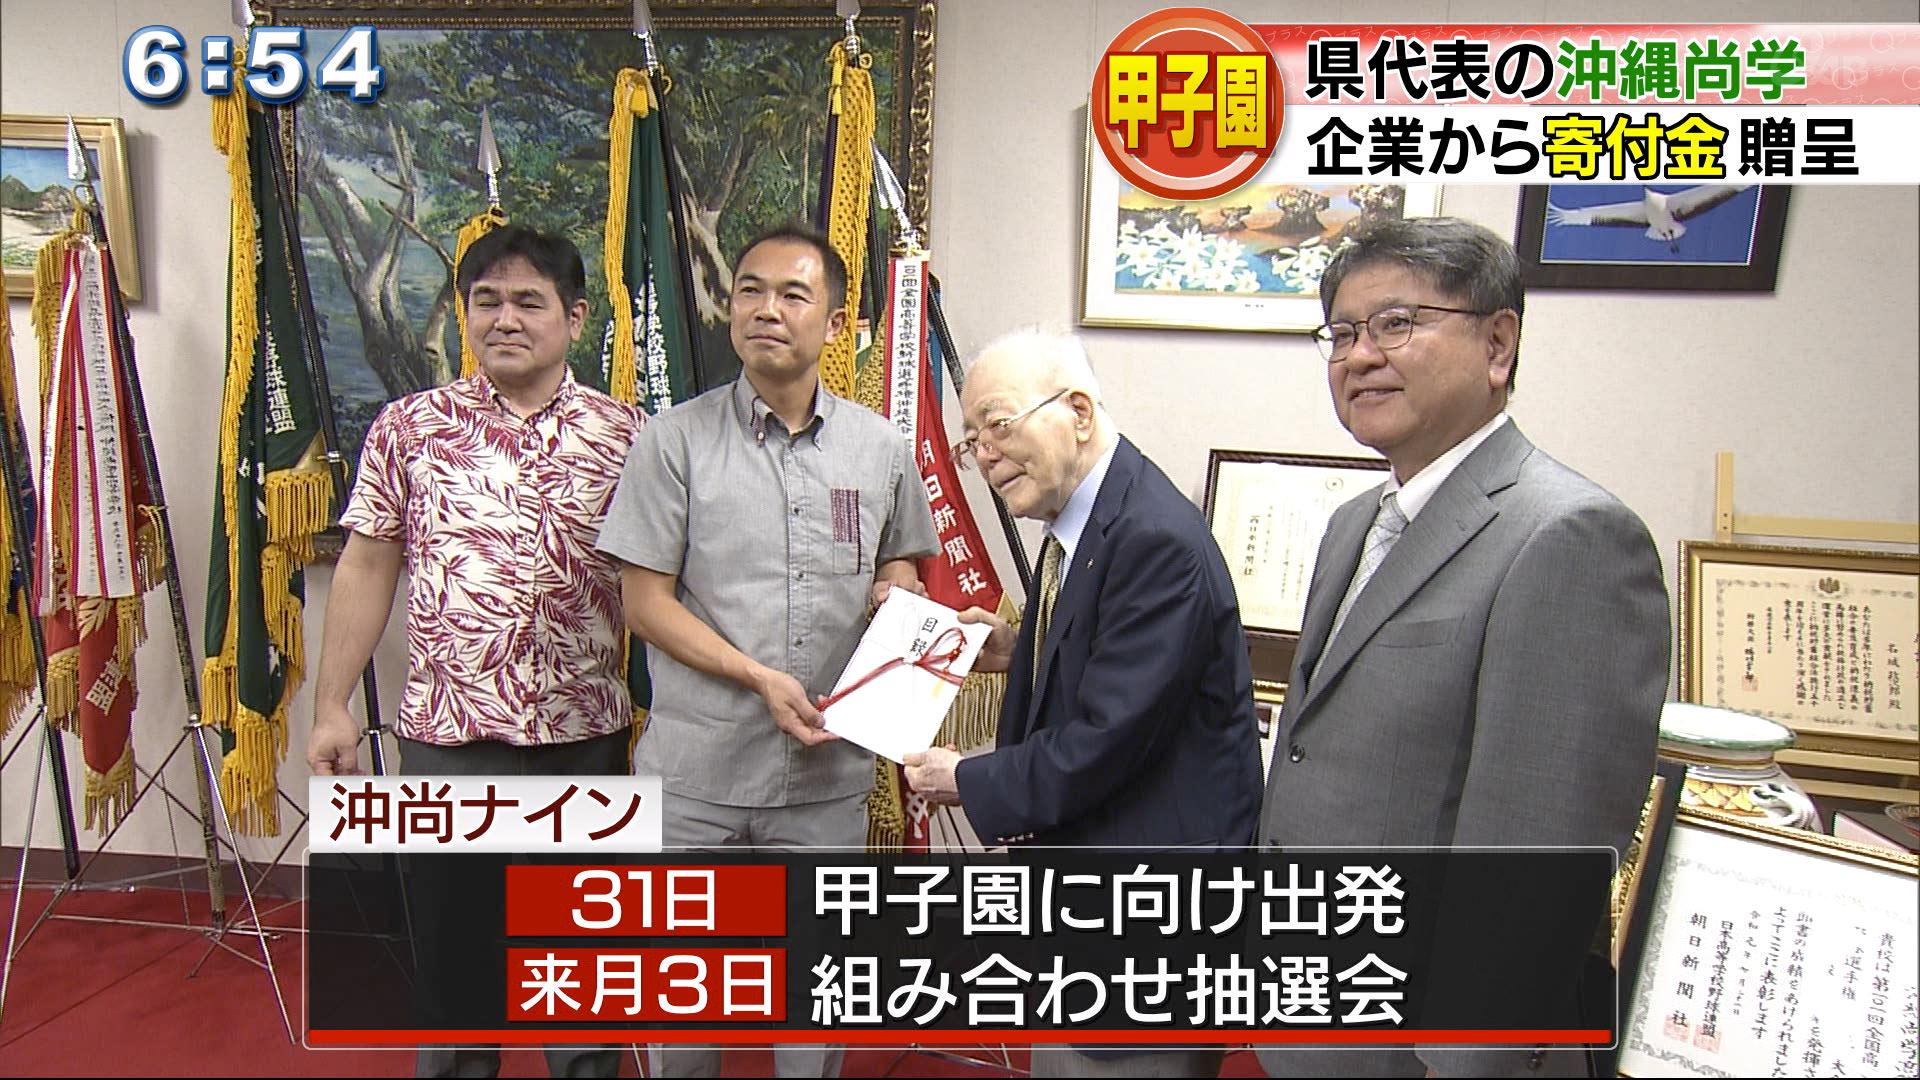 甲子園出場の沖縄尚学高校に寄付金贈呈